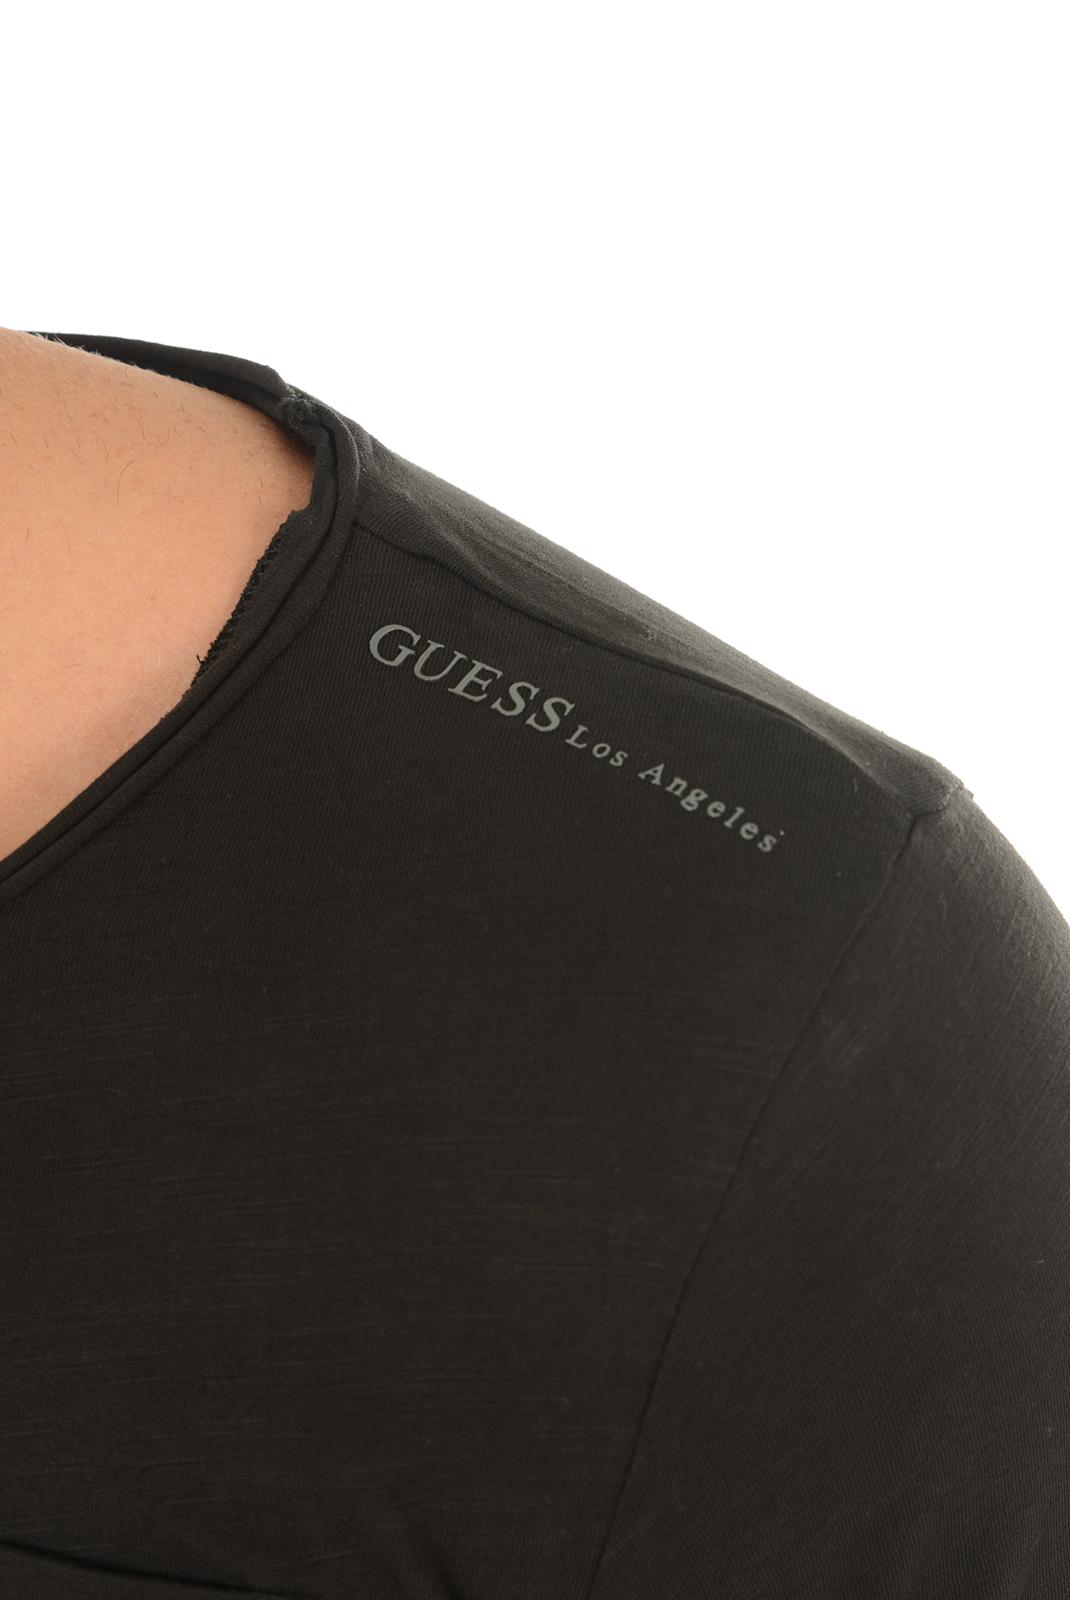 Tee-shirts  Guess jeans M63P49K4NV0 A996 NOIR